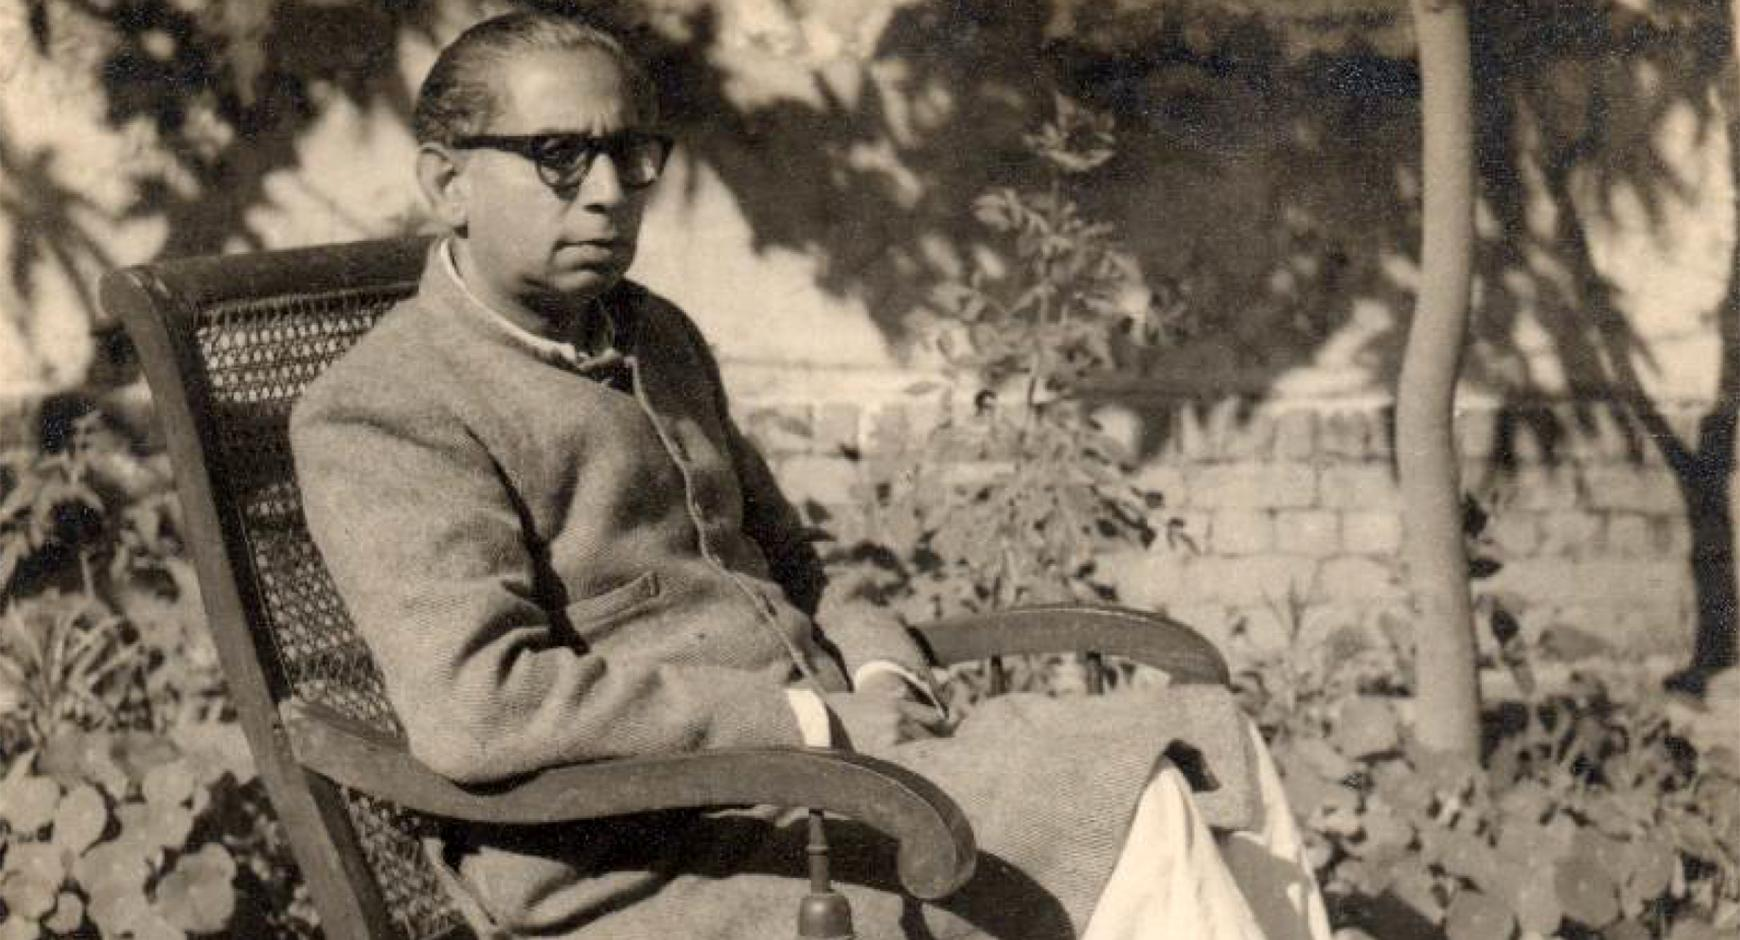 urdu writer sajjad zaheer reclining in chair. black and white.